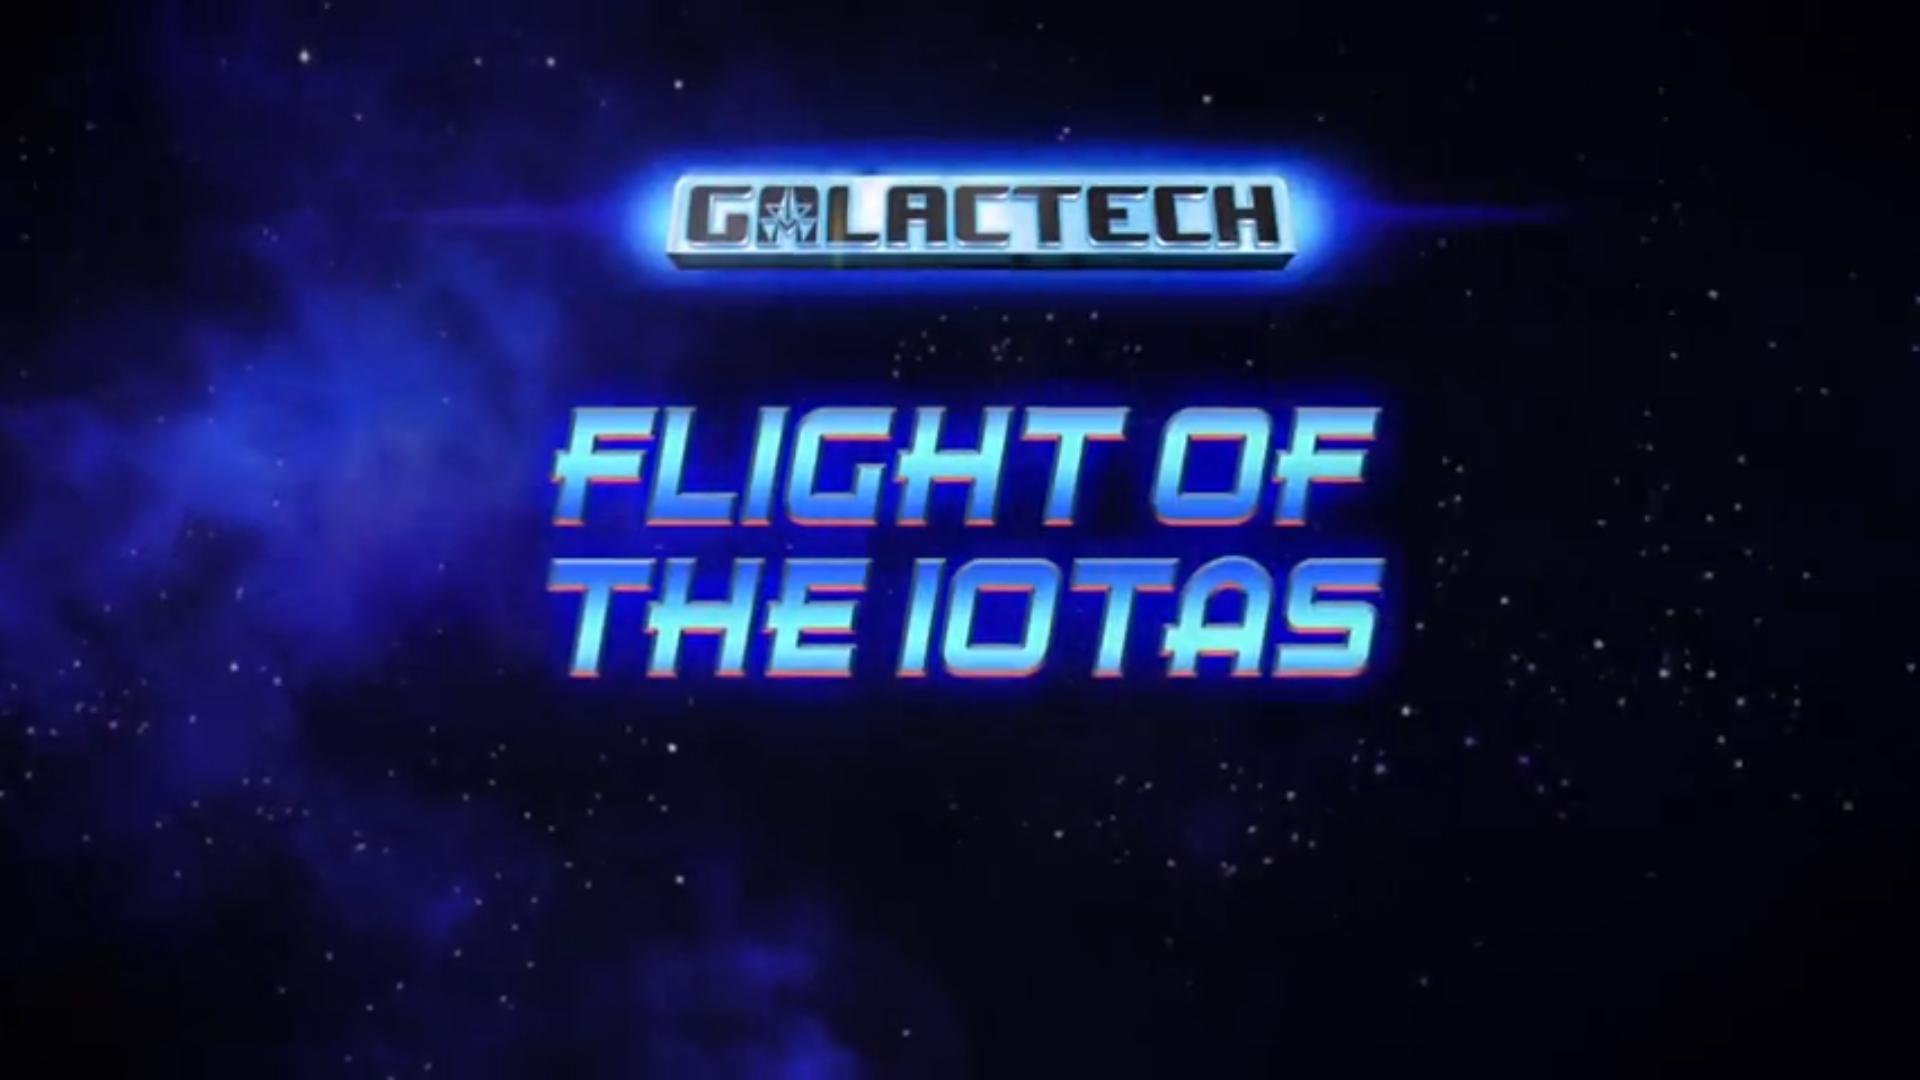 Galactech: Flight of the Iotas